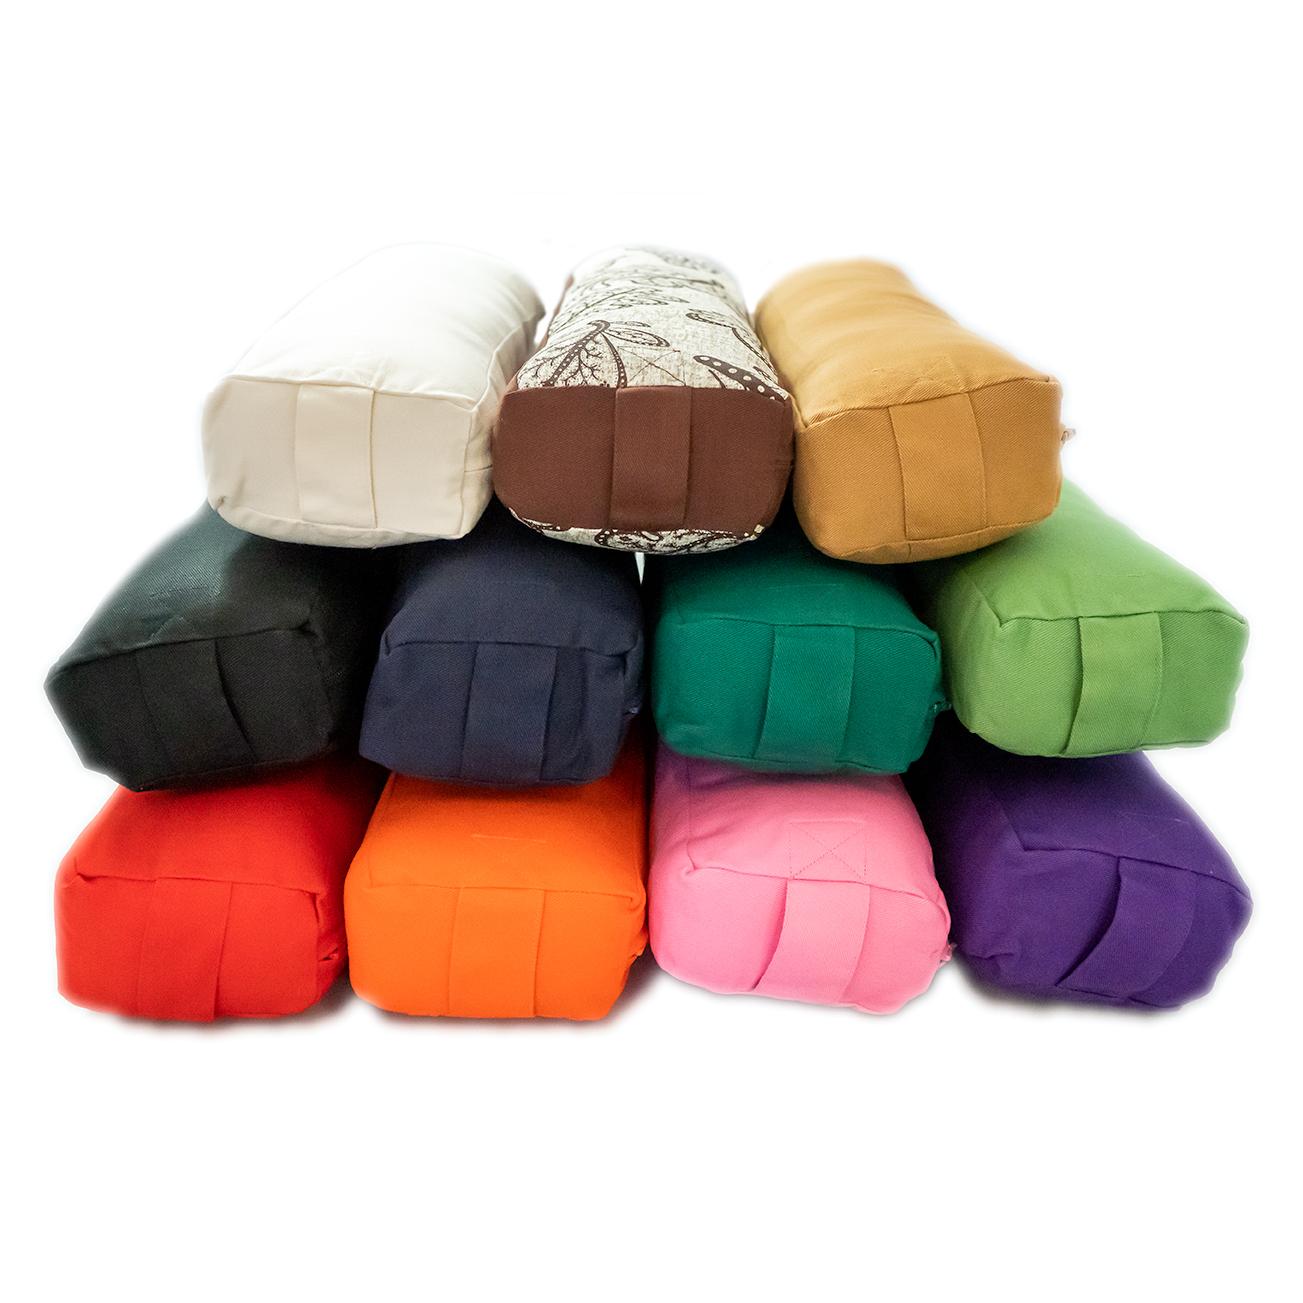 Pranayama Cotton Yoga Bolster Yoga Direct